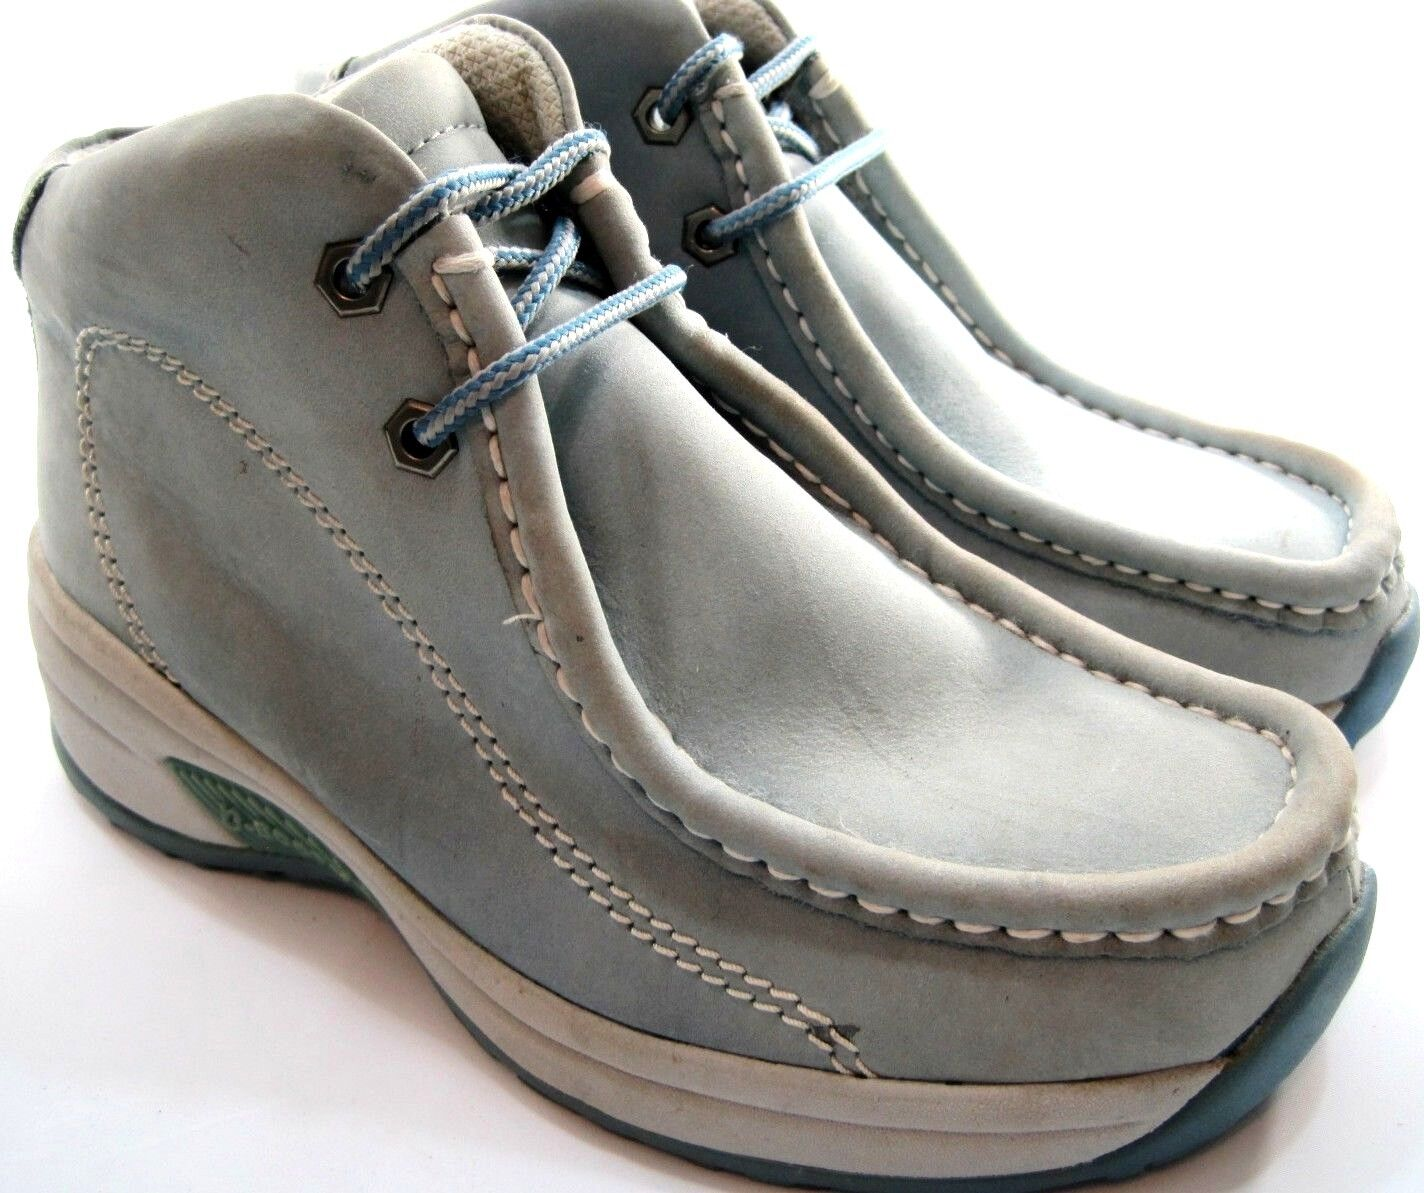 Buffalino Lady B-Stiefel Desert Stiefel Größe 7 Euro 37 Blau Lace-Up Chukka